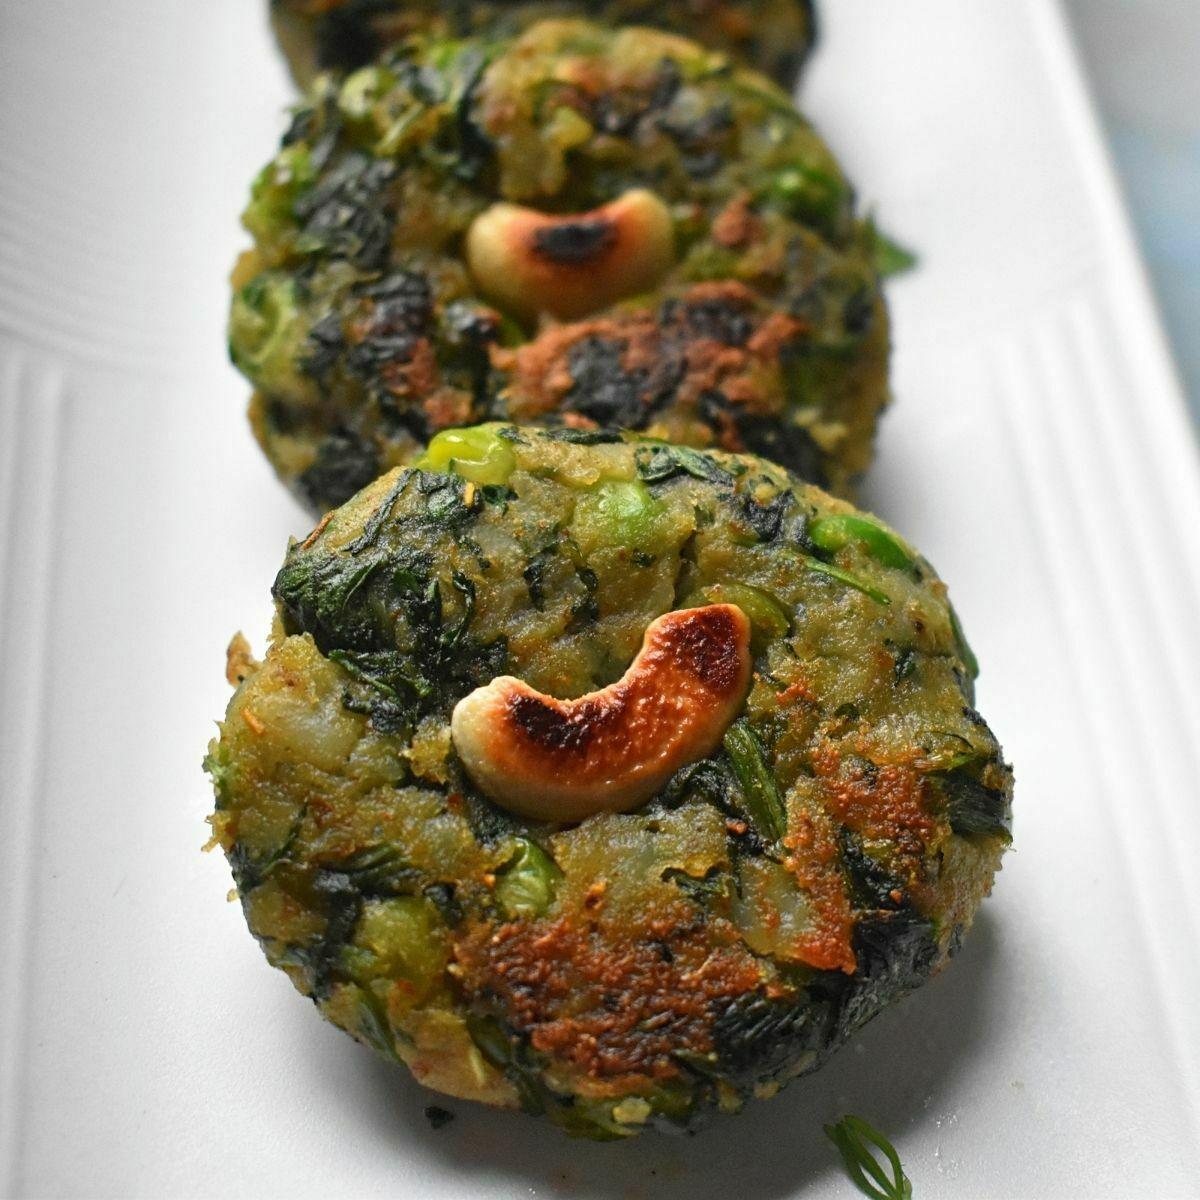 hara bhara recipe